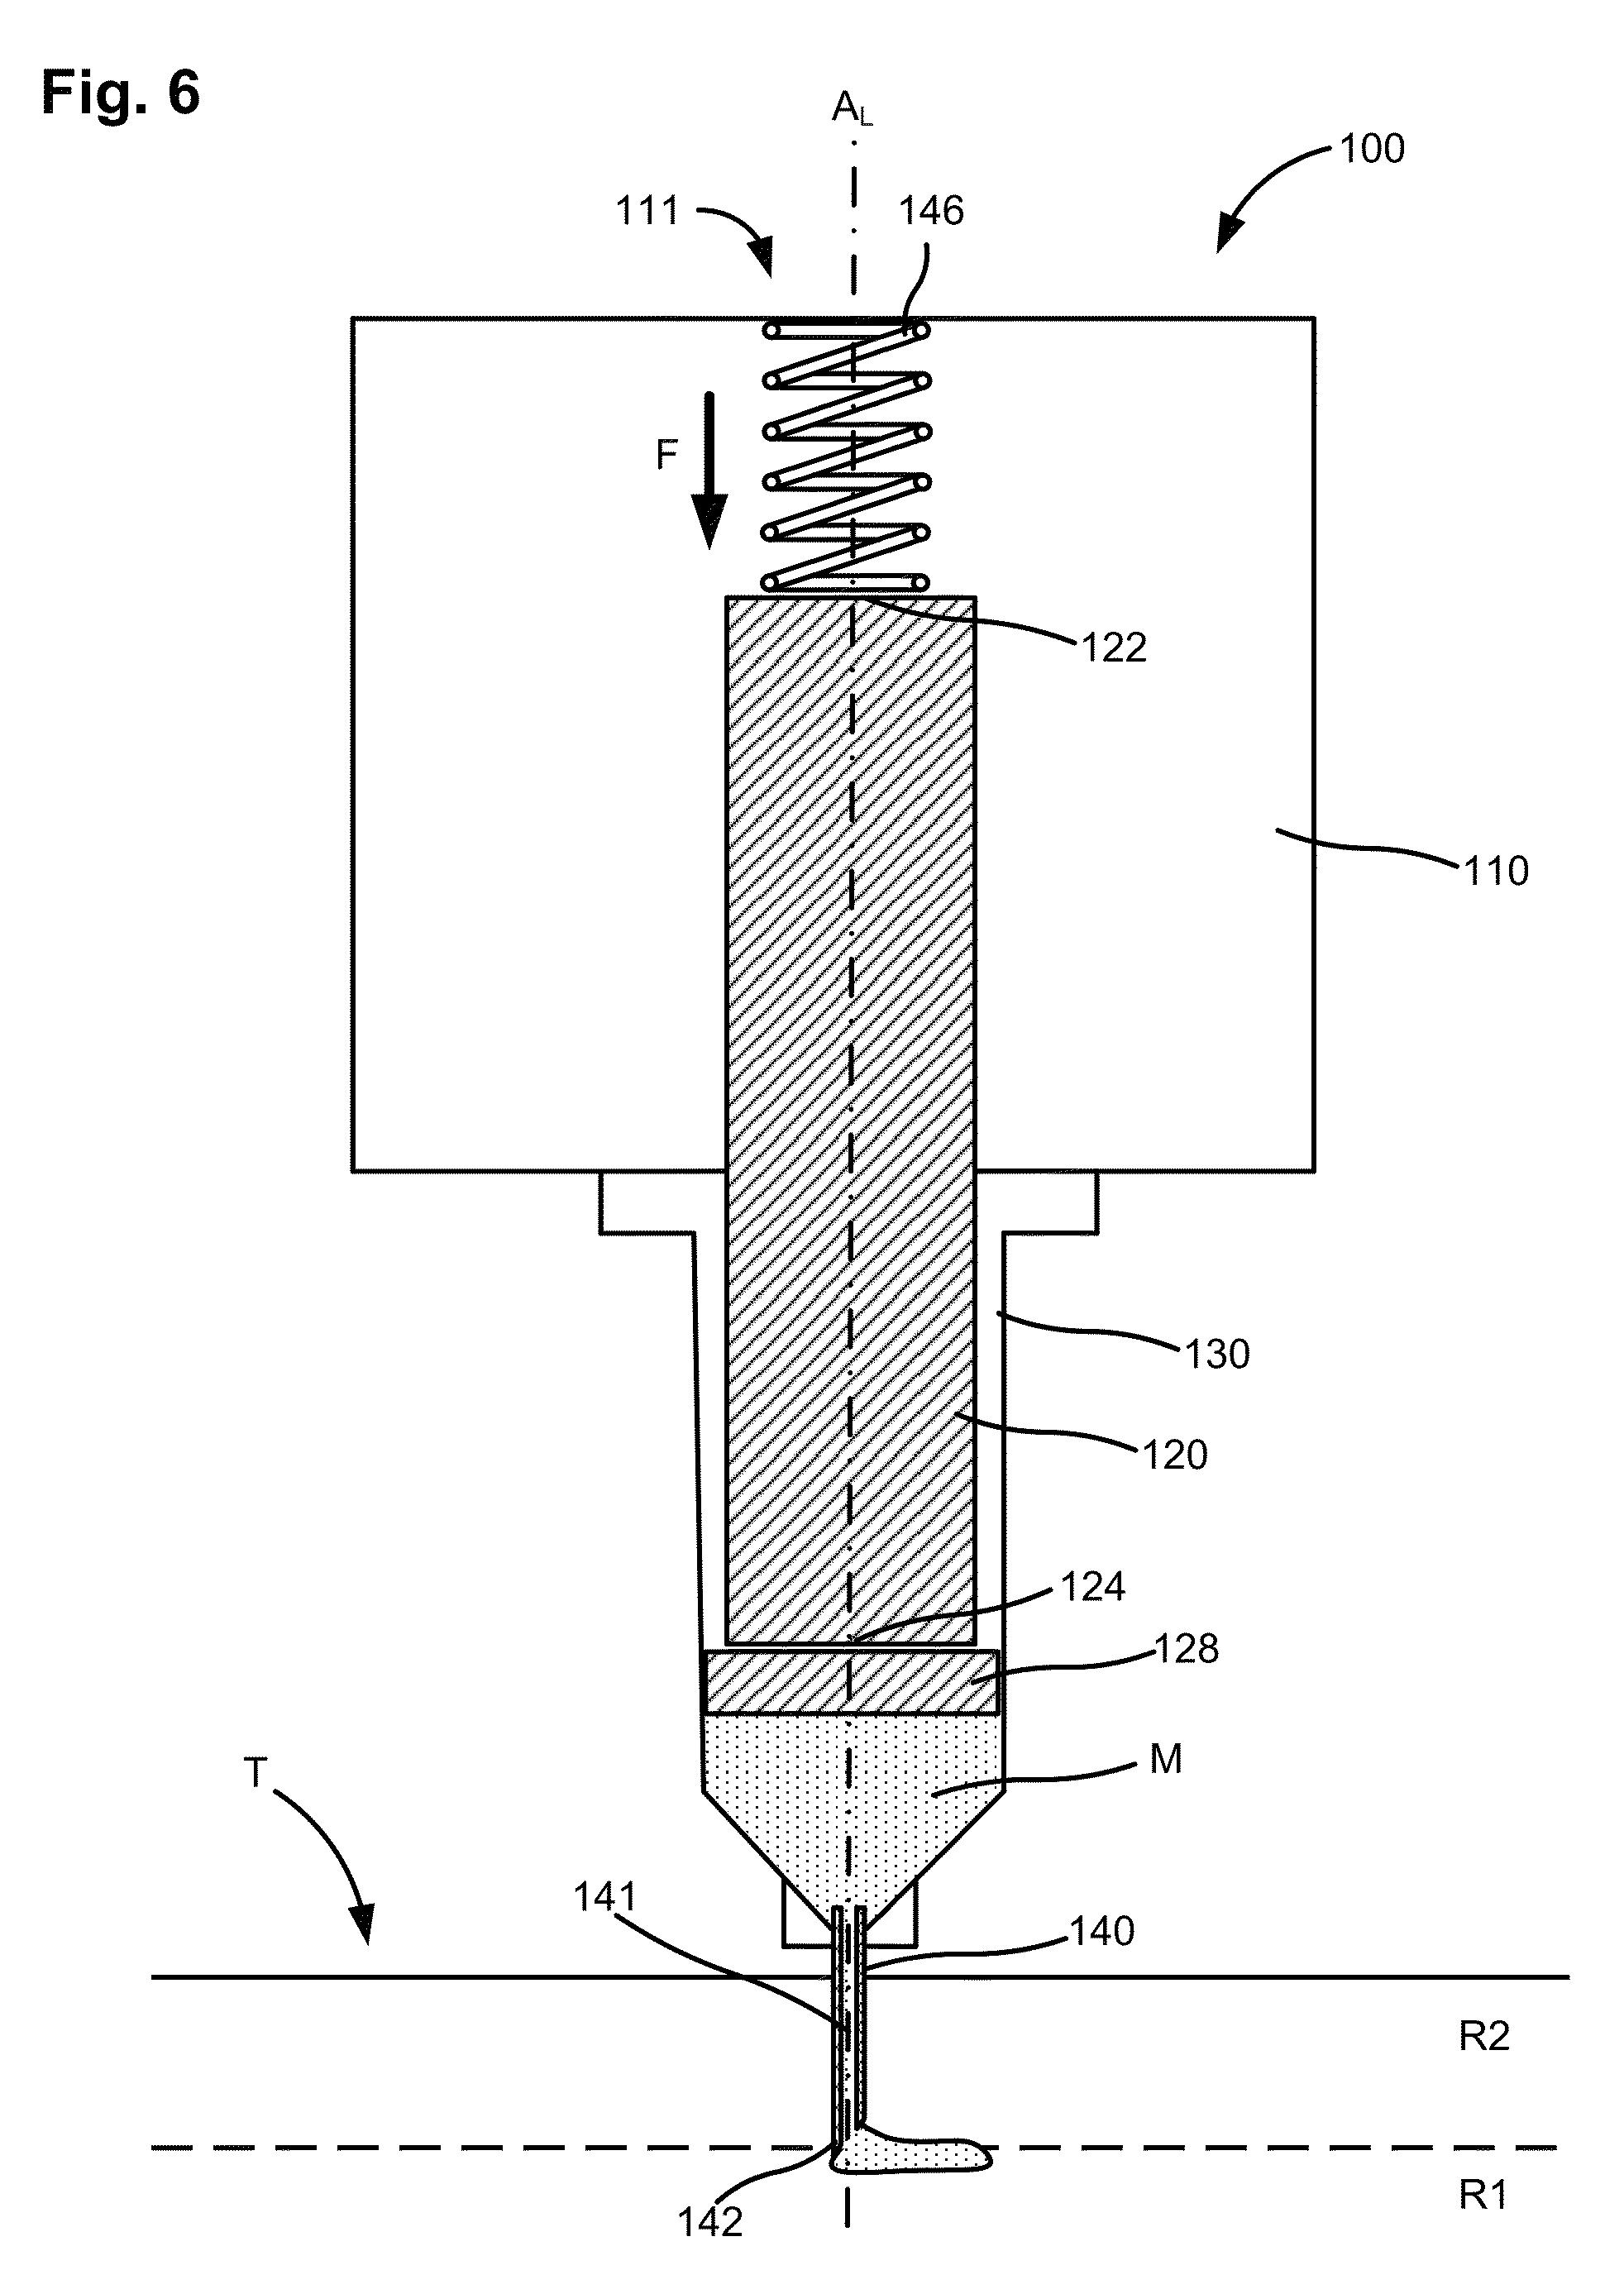 Patent US 9,180,047 B2 on